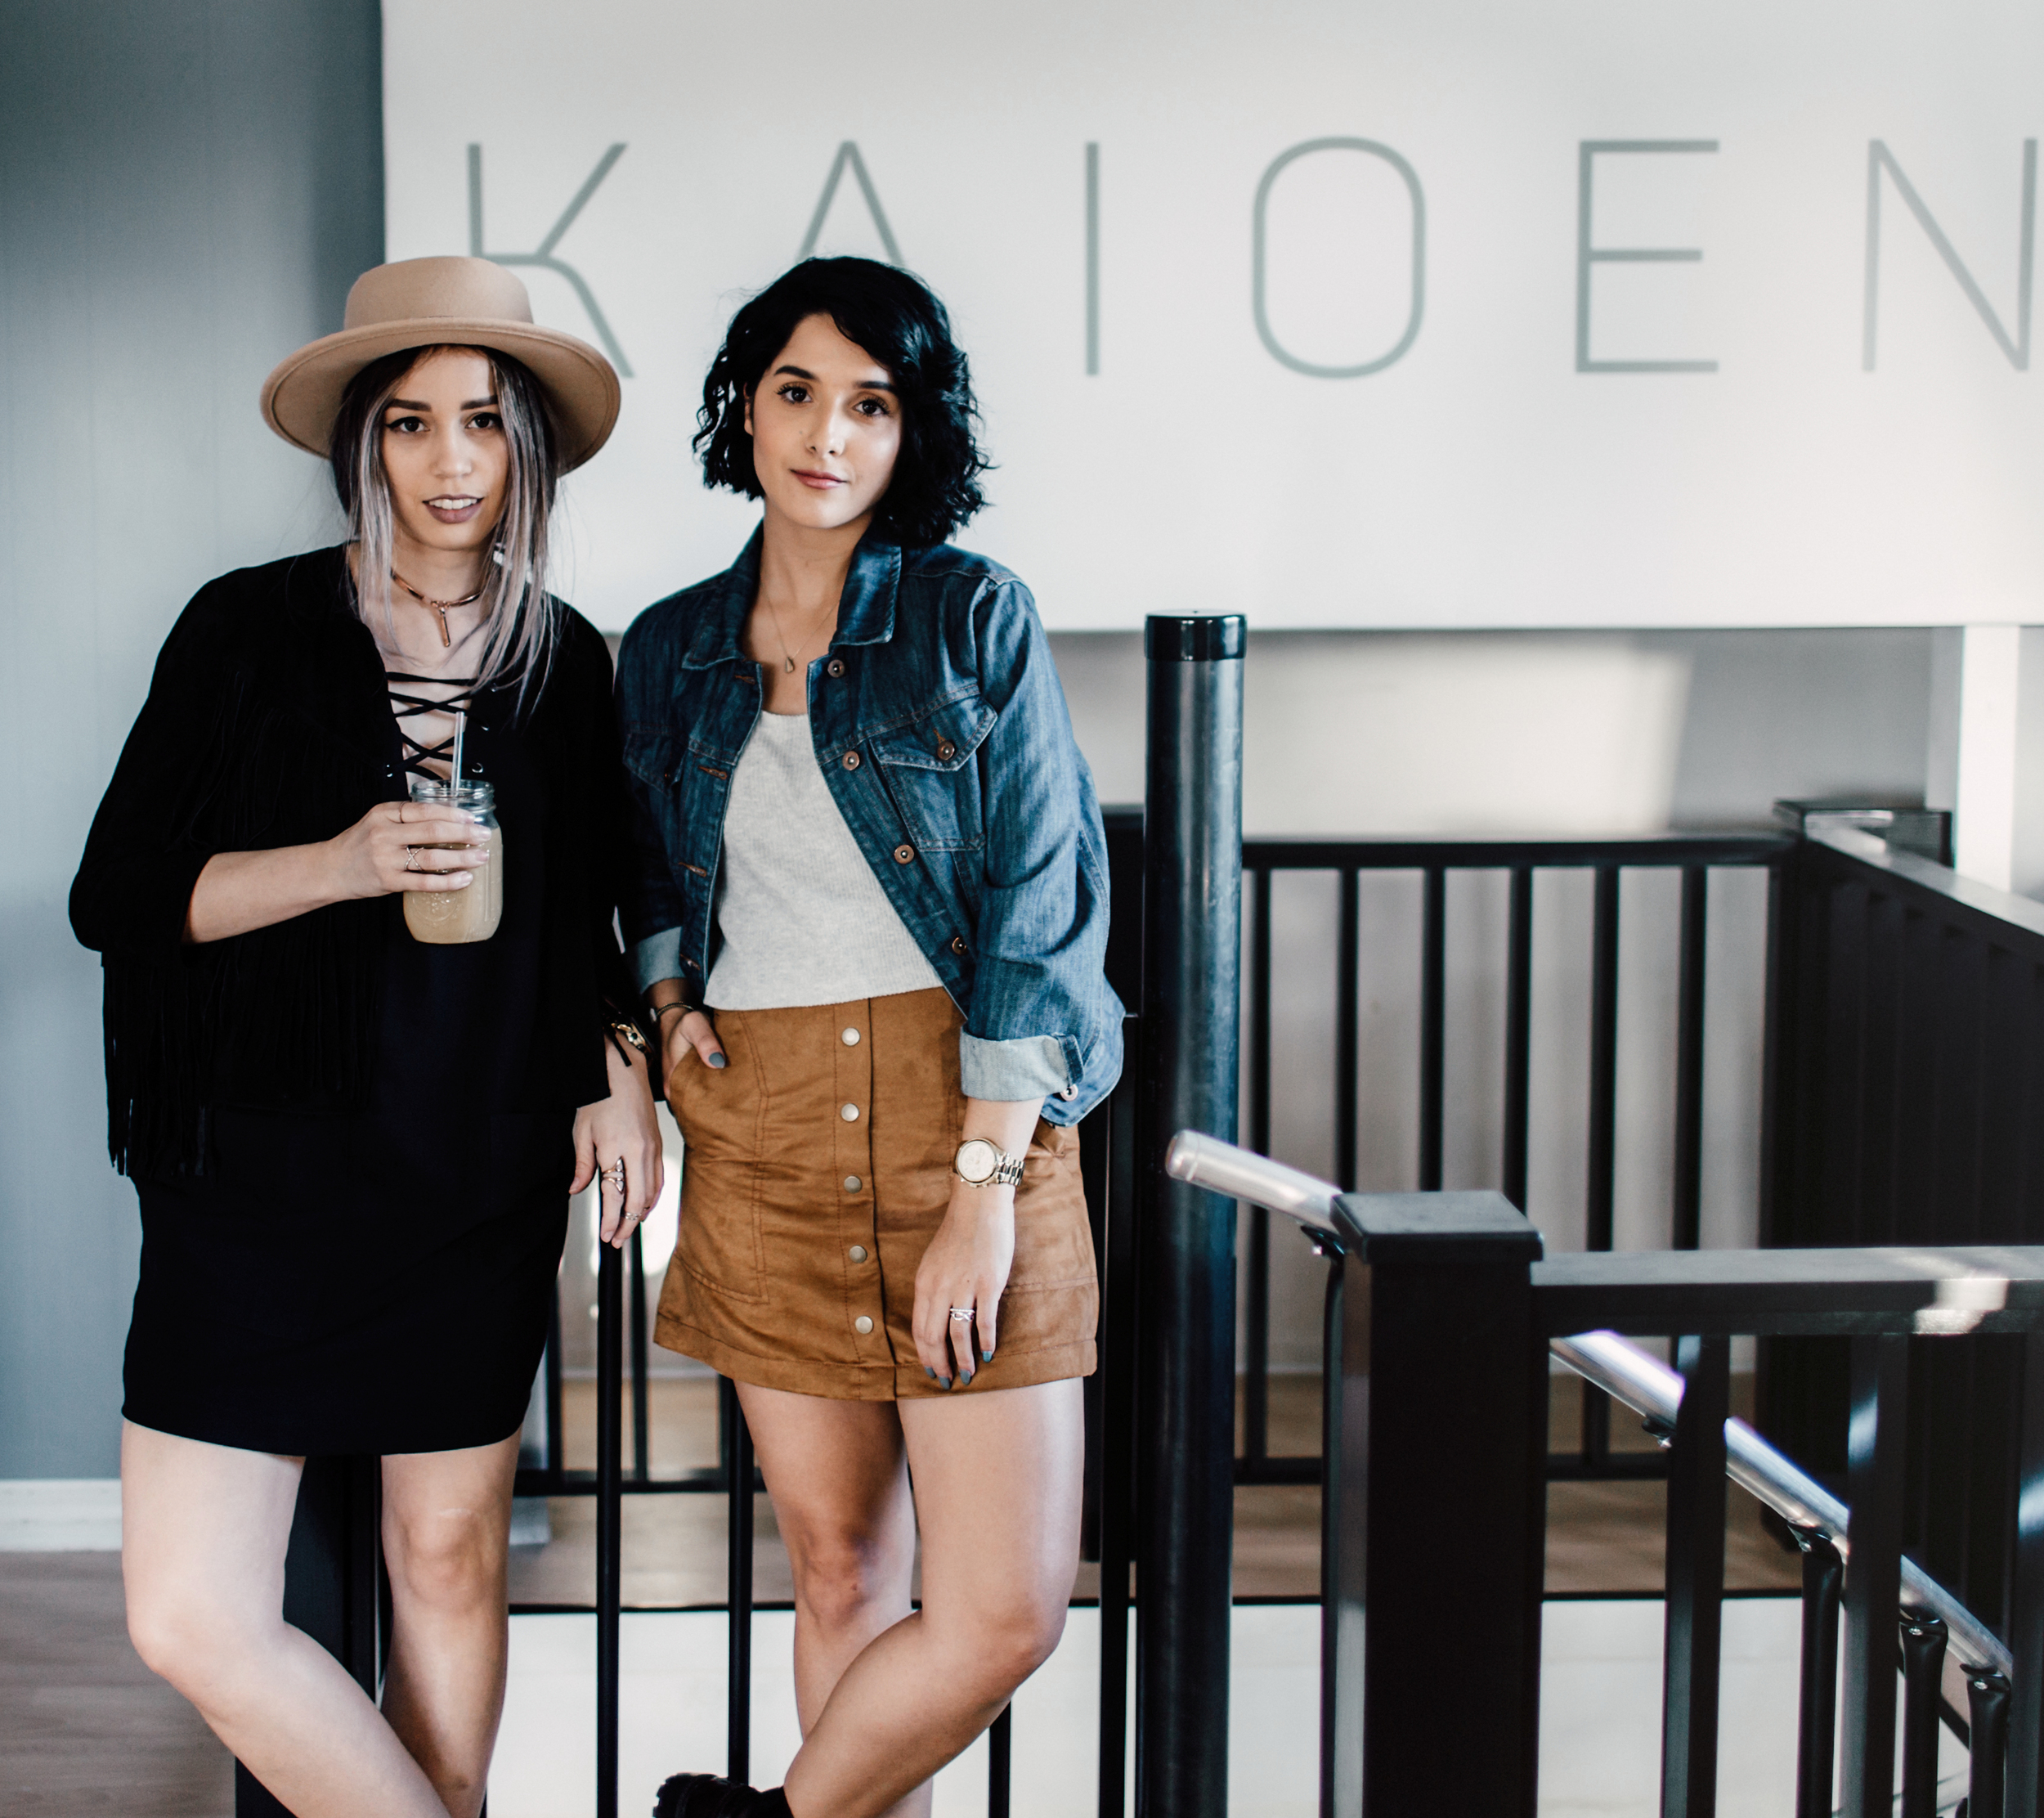 Kaioen Coffee 1 (150 of 59)vanessaboy.com Final web.jpg